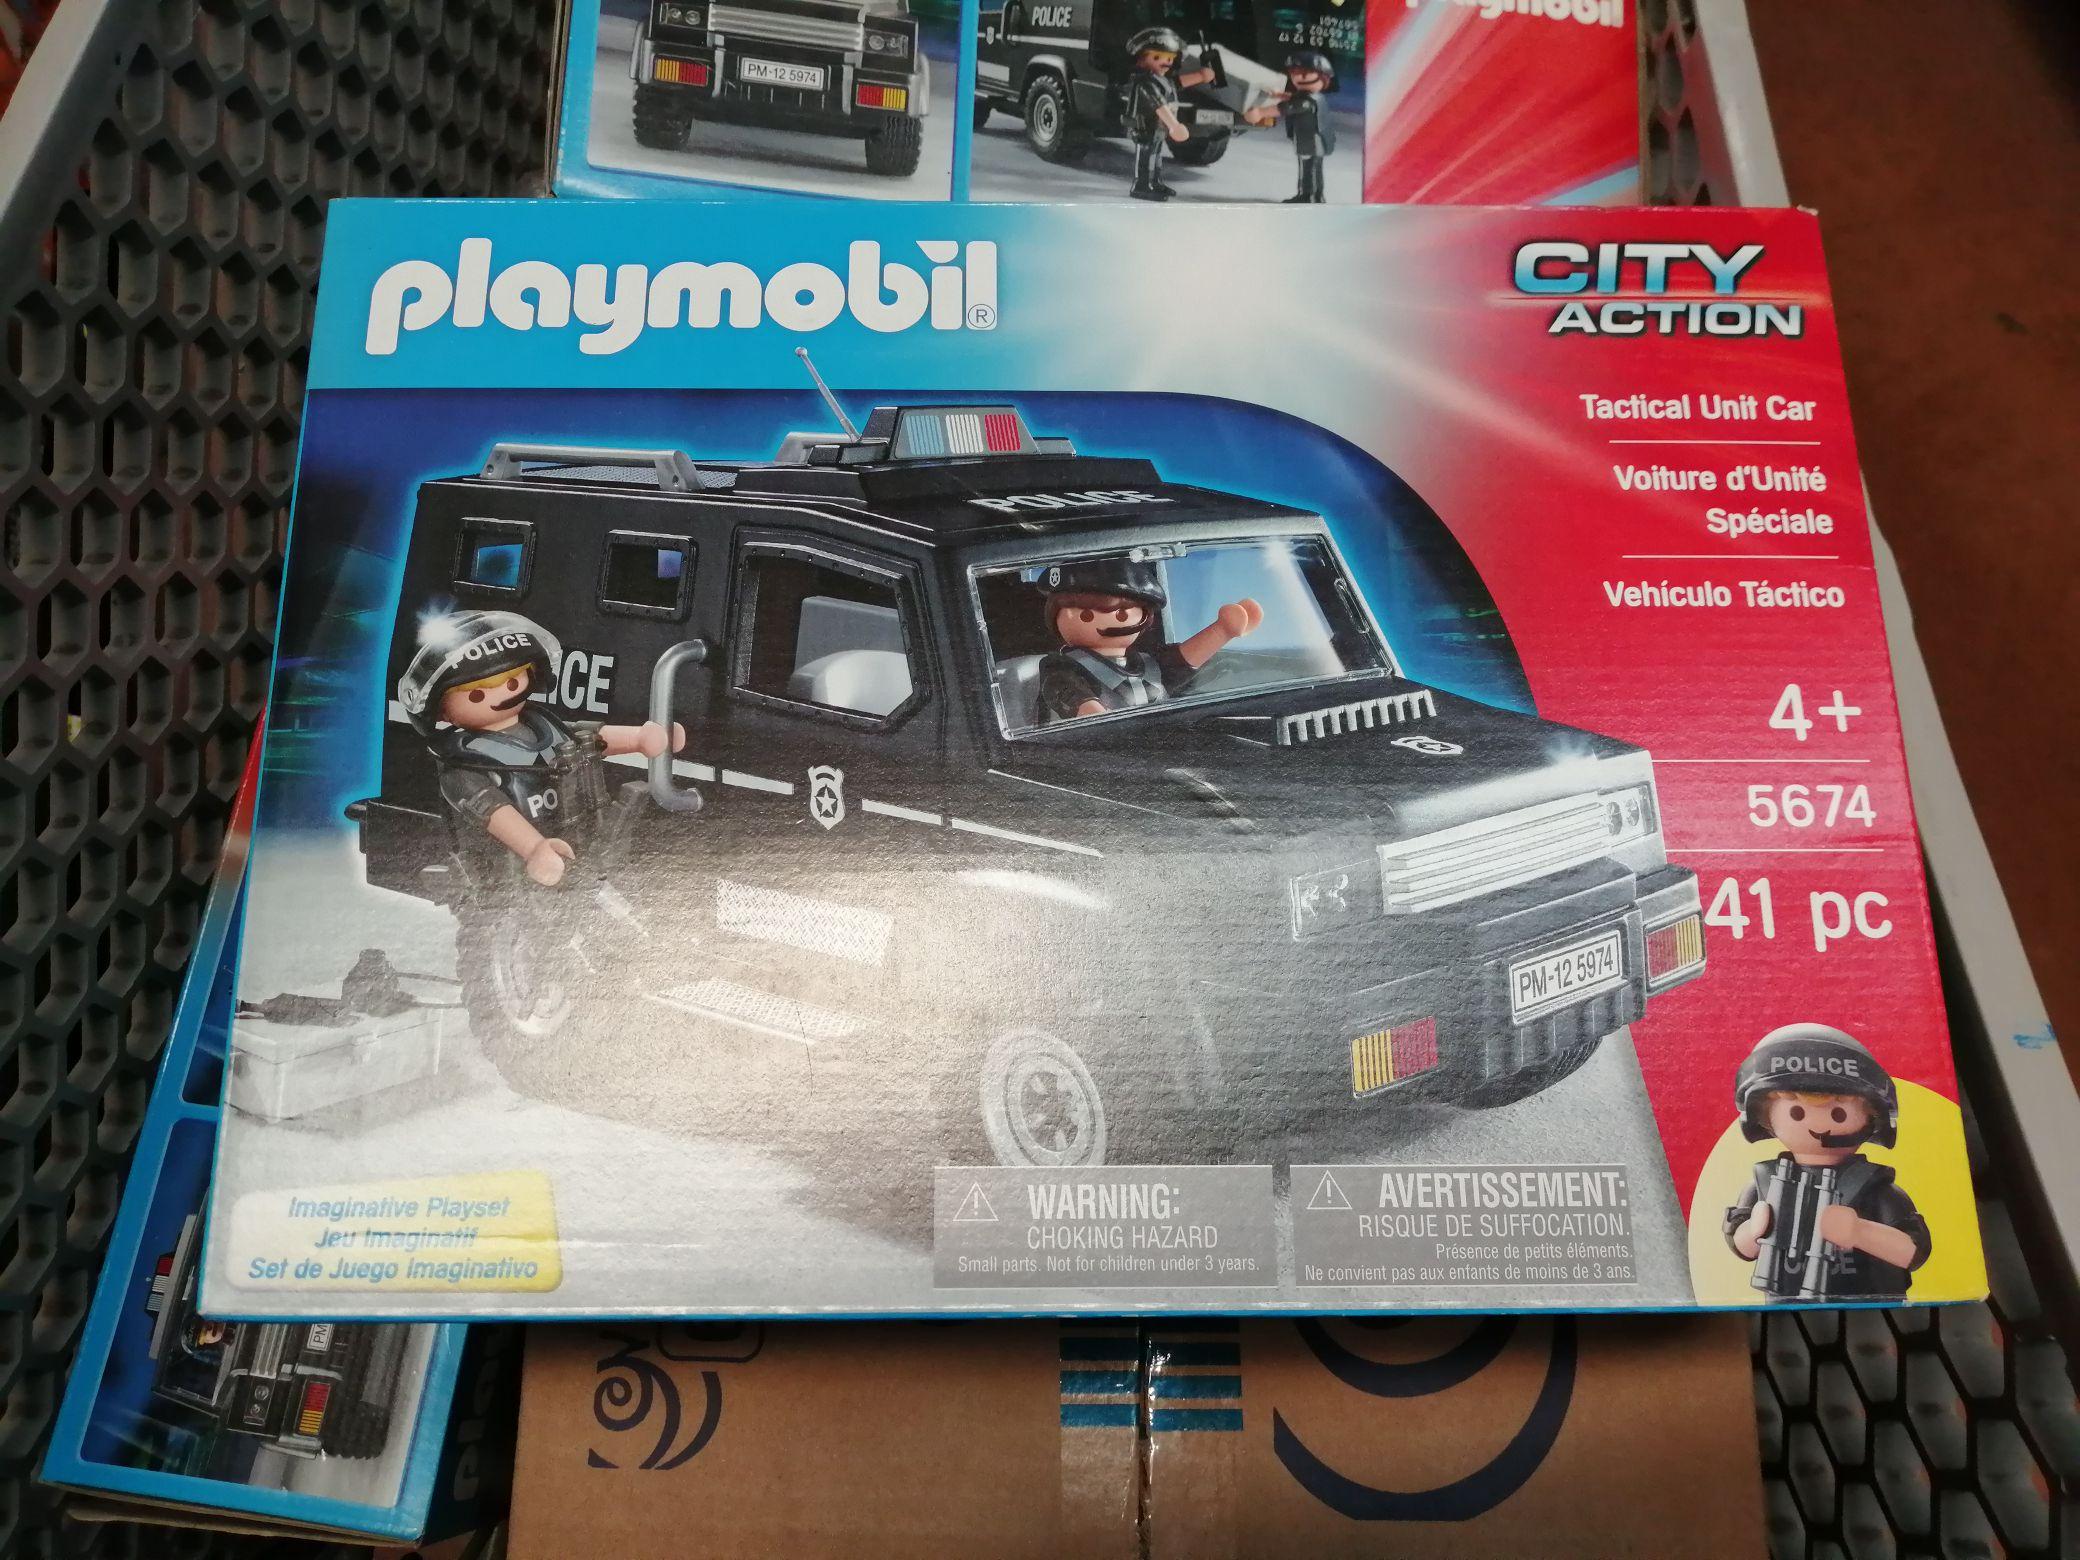 Walmart: Playmobil Swat City Action.